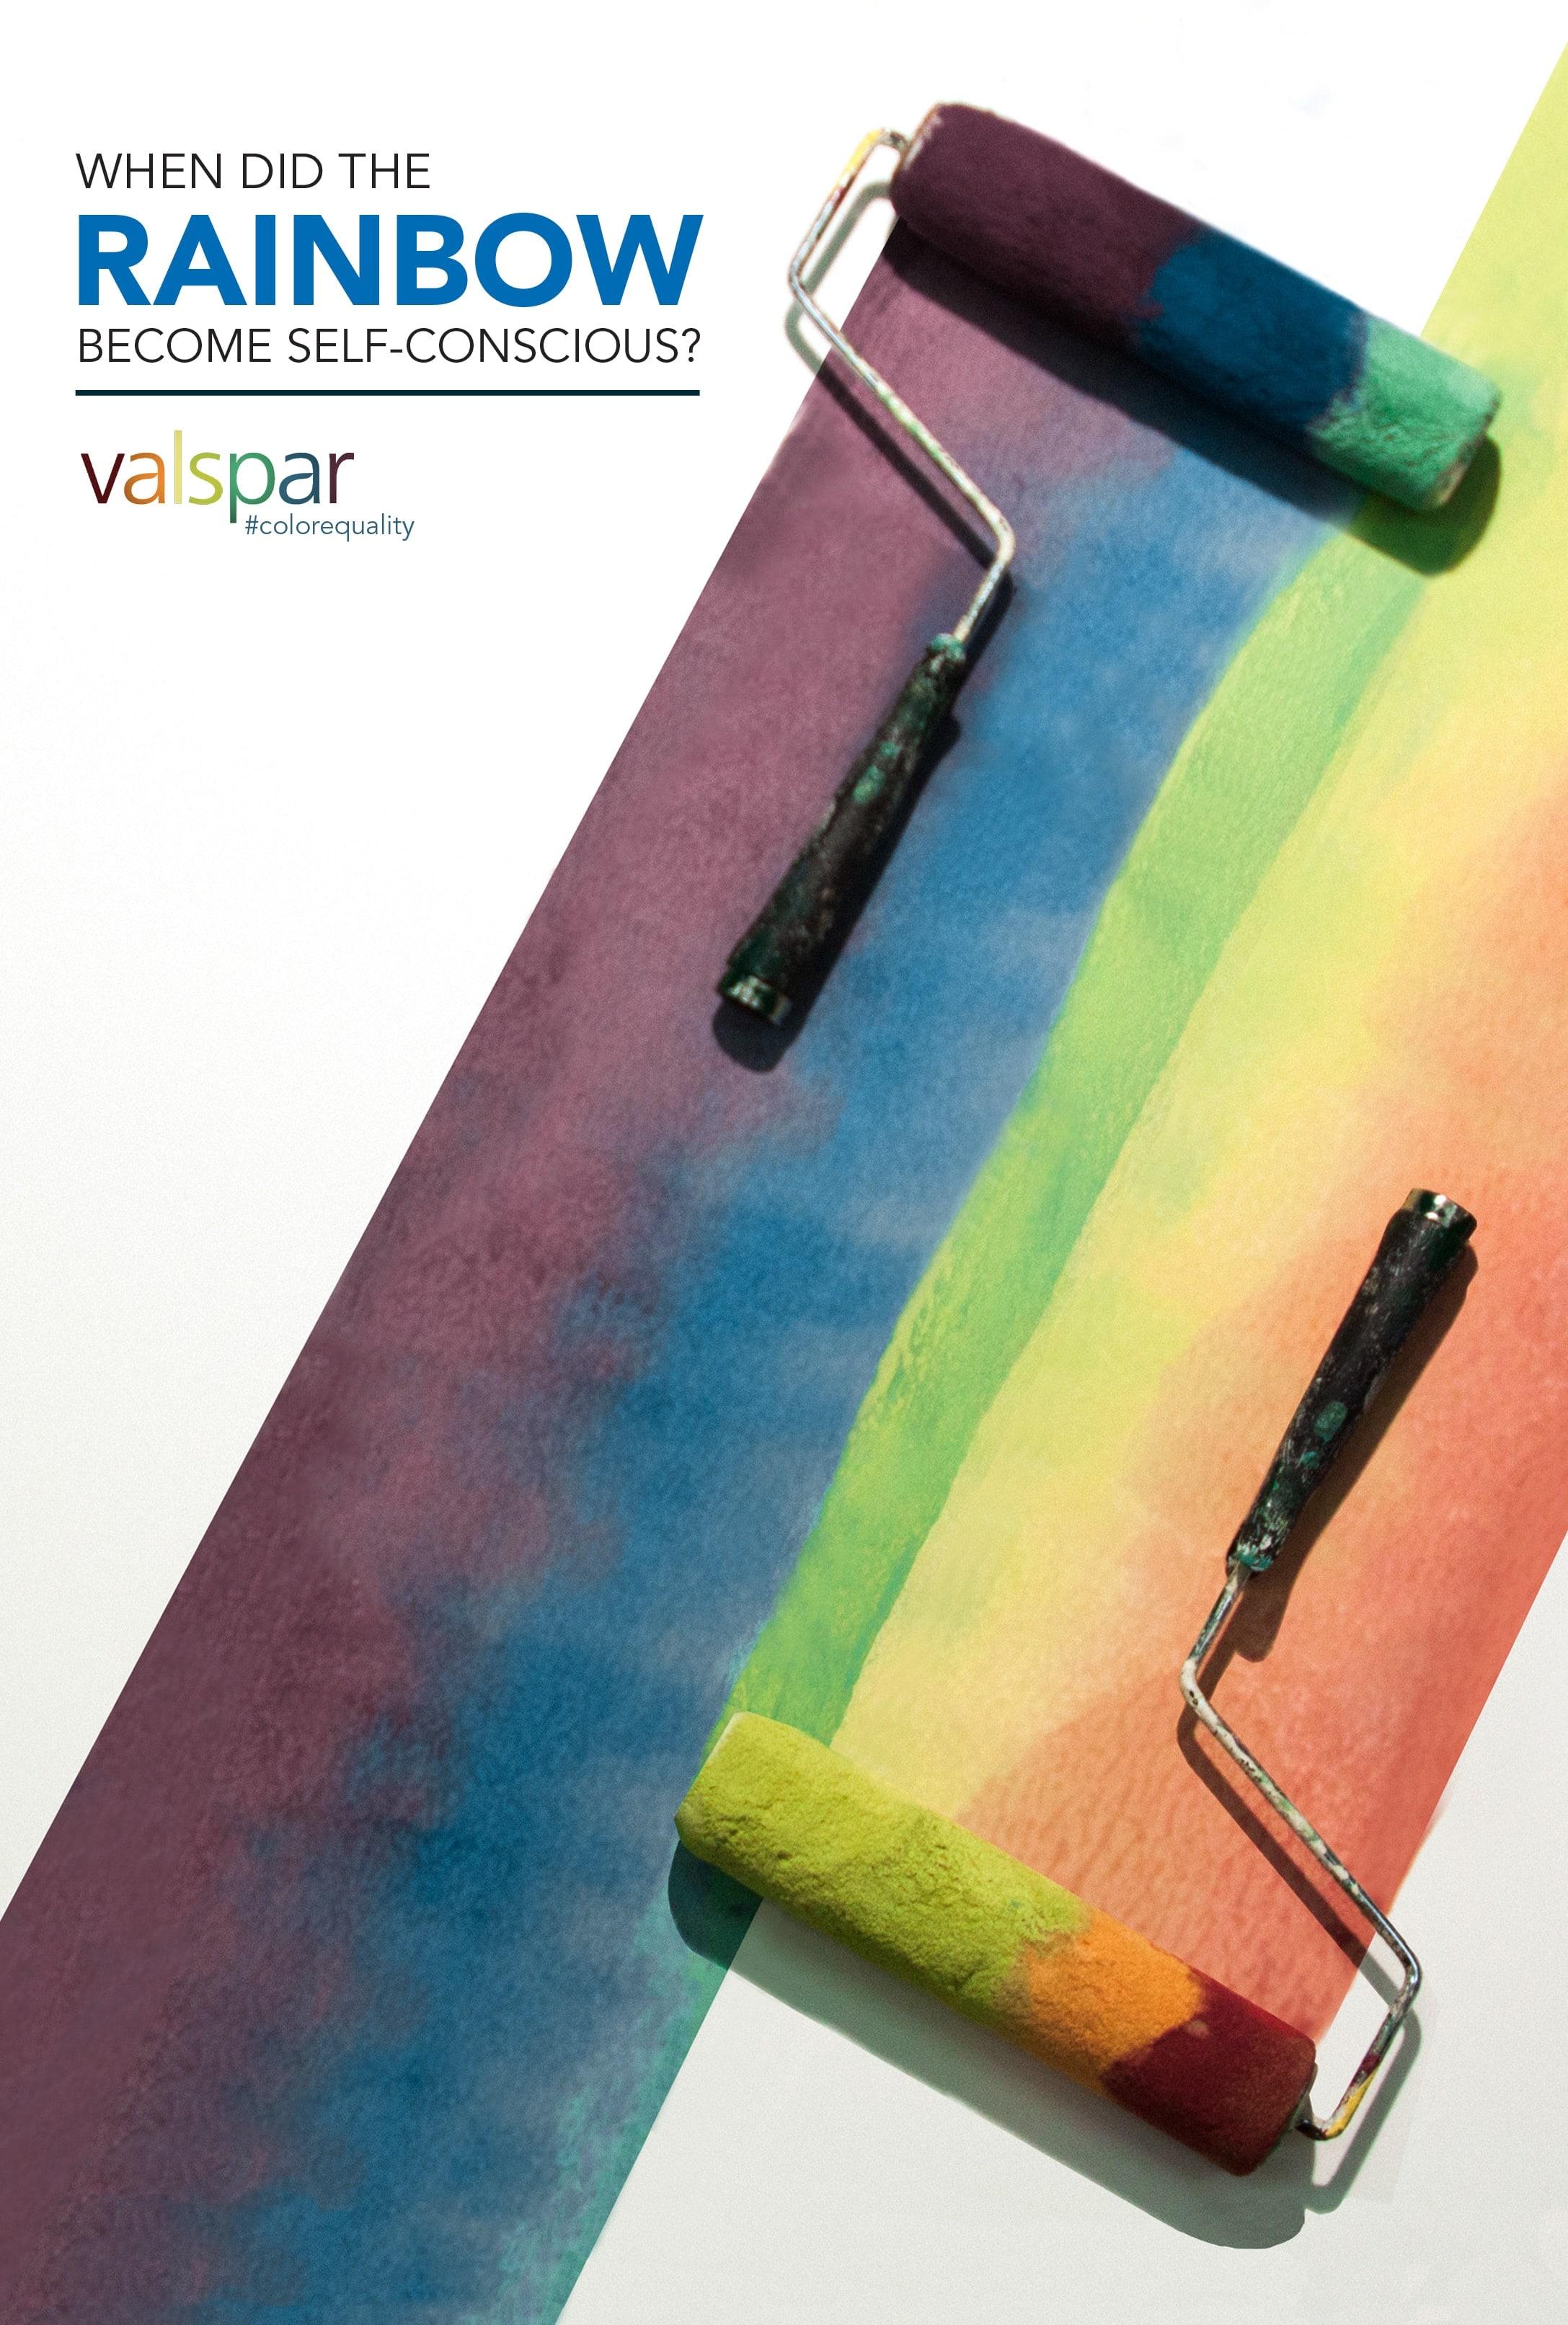 Valspar_PrintAd3_Rainbow-min.jpg